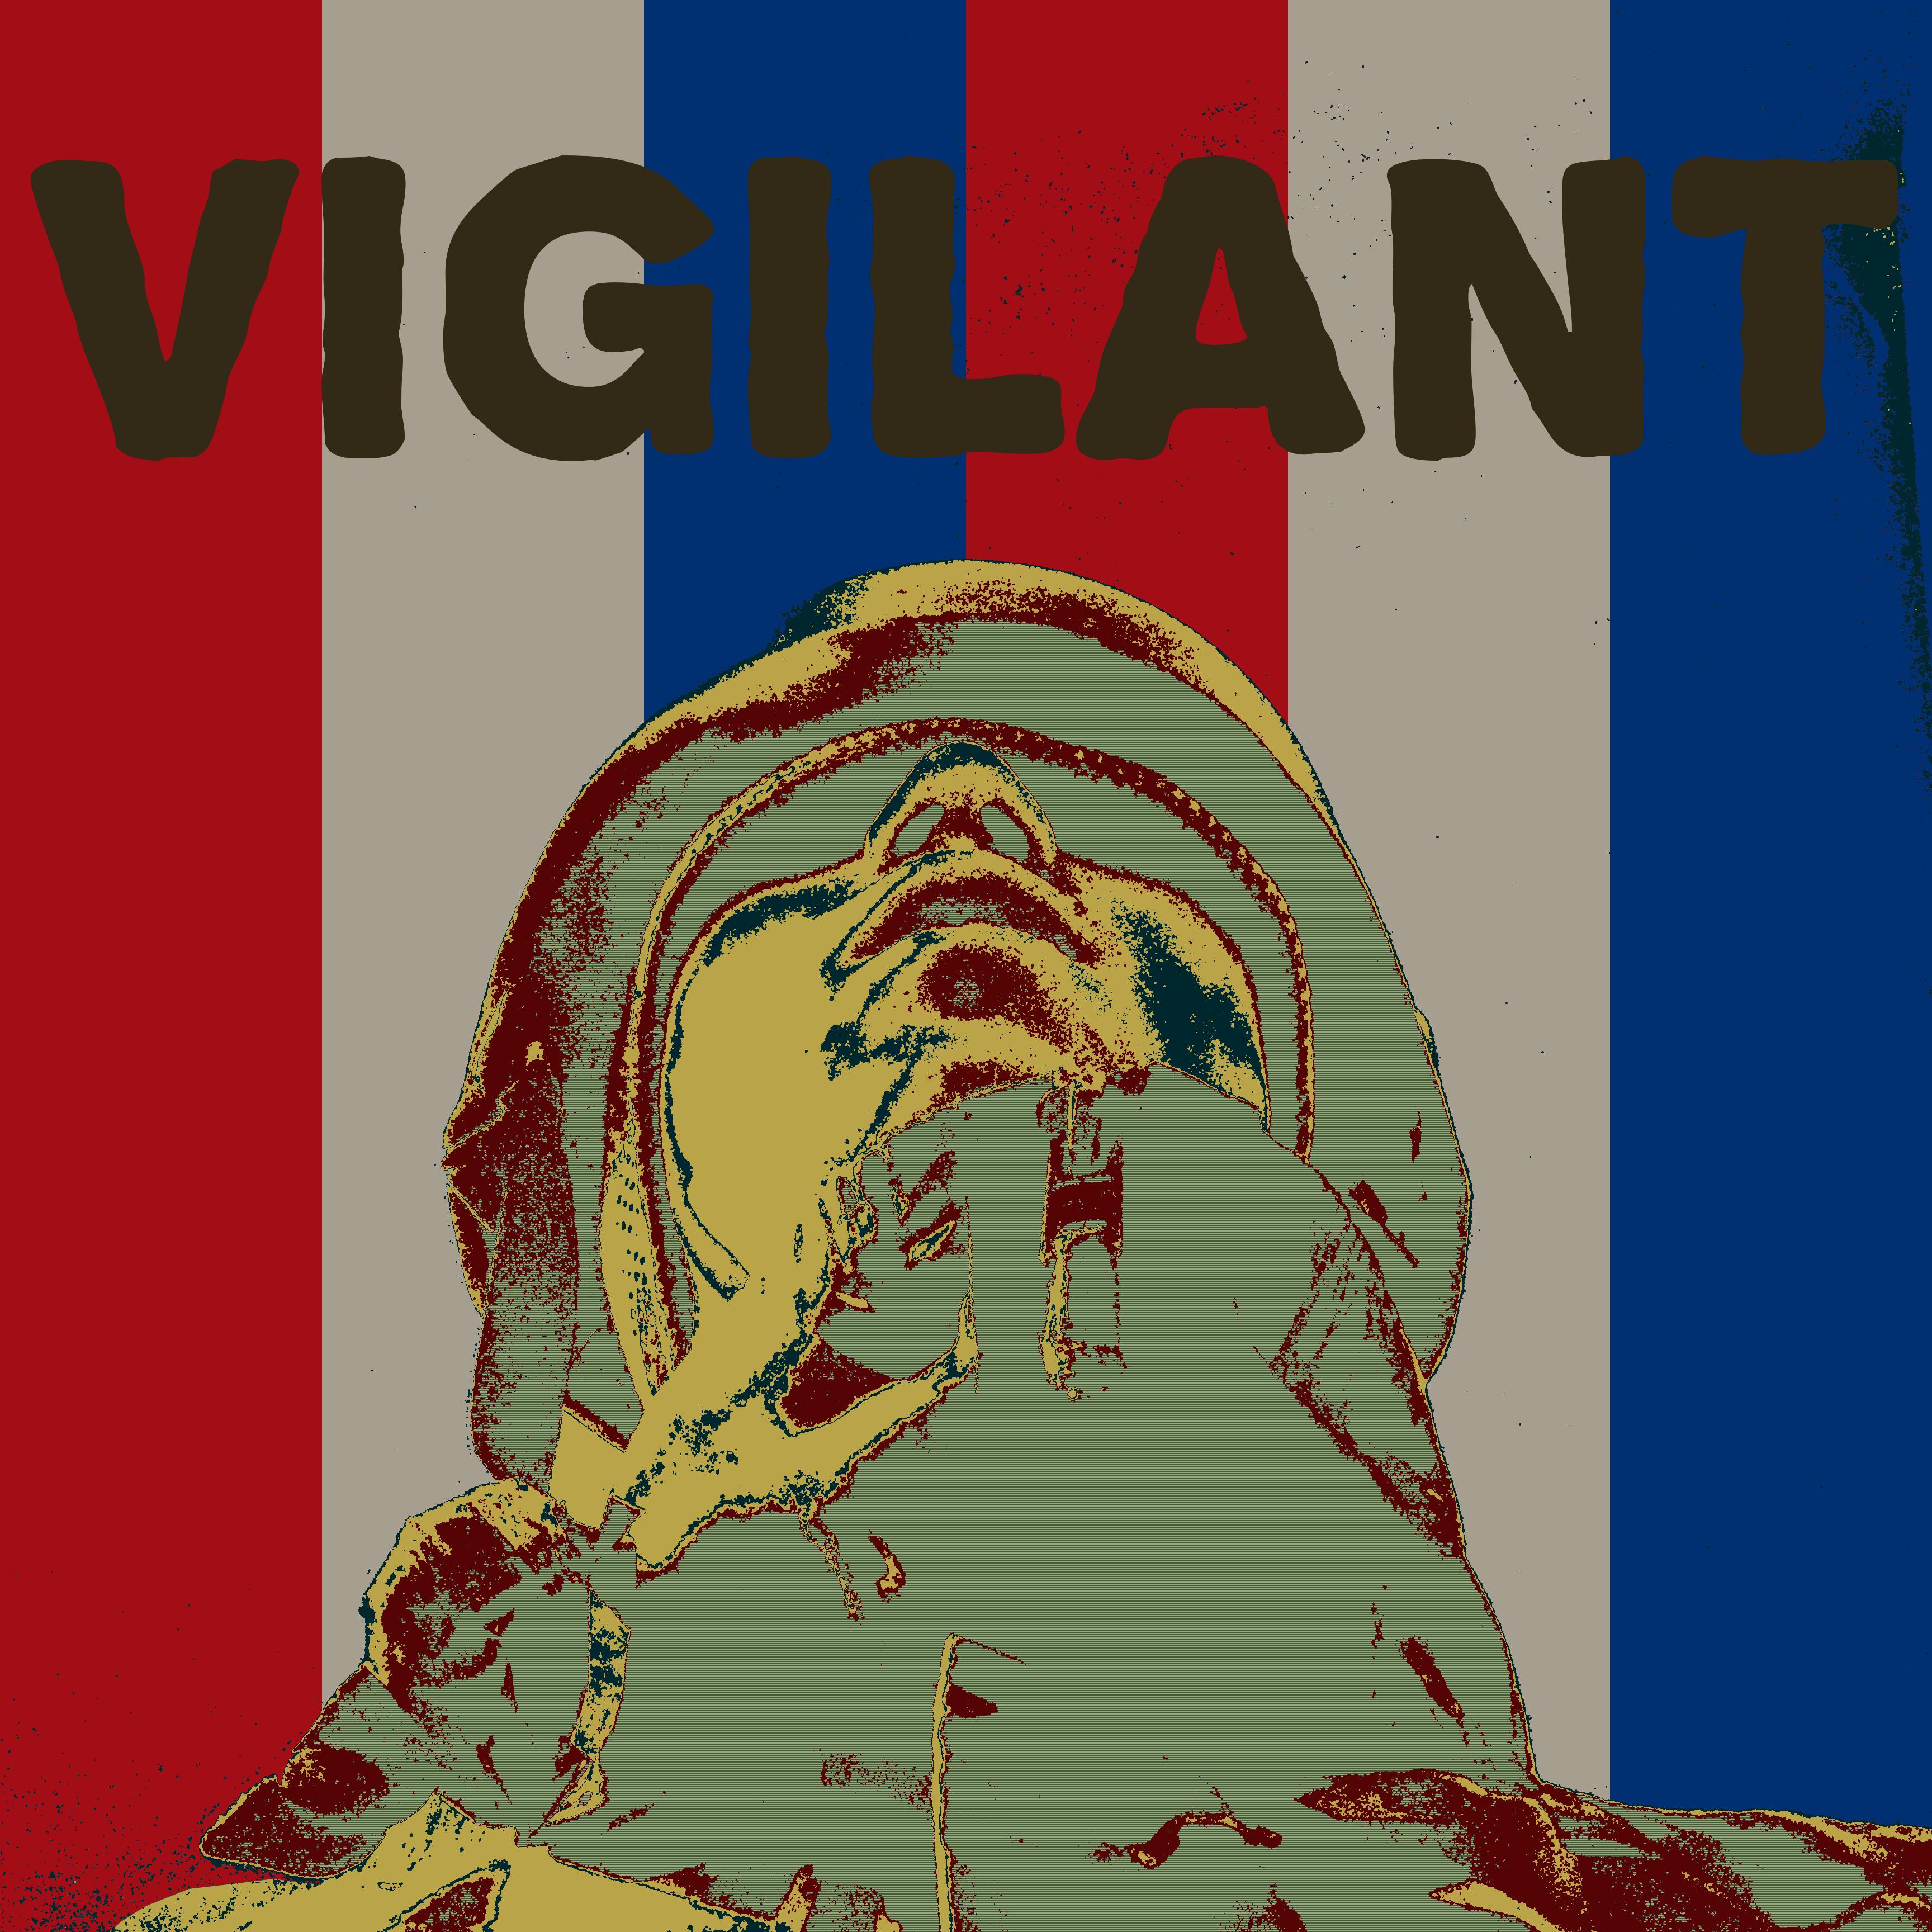 -=-=-= RAID: WWII Poster - 'Vigilant' =-=-=- by FoxValoKne